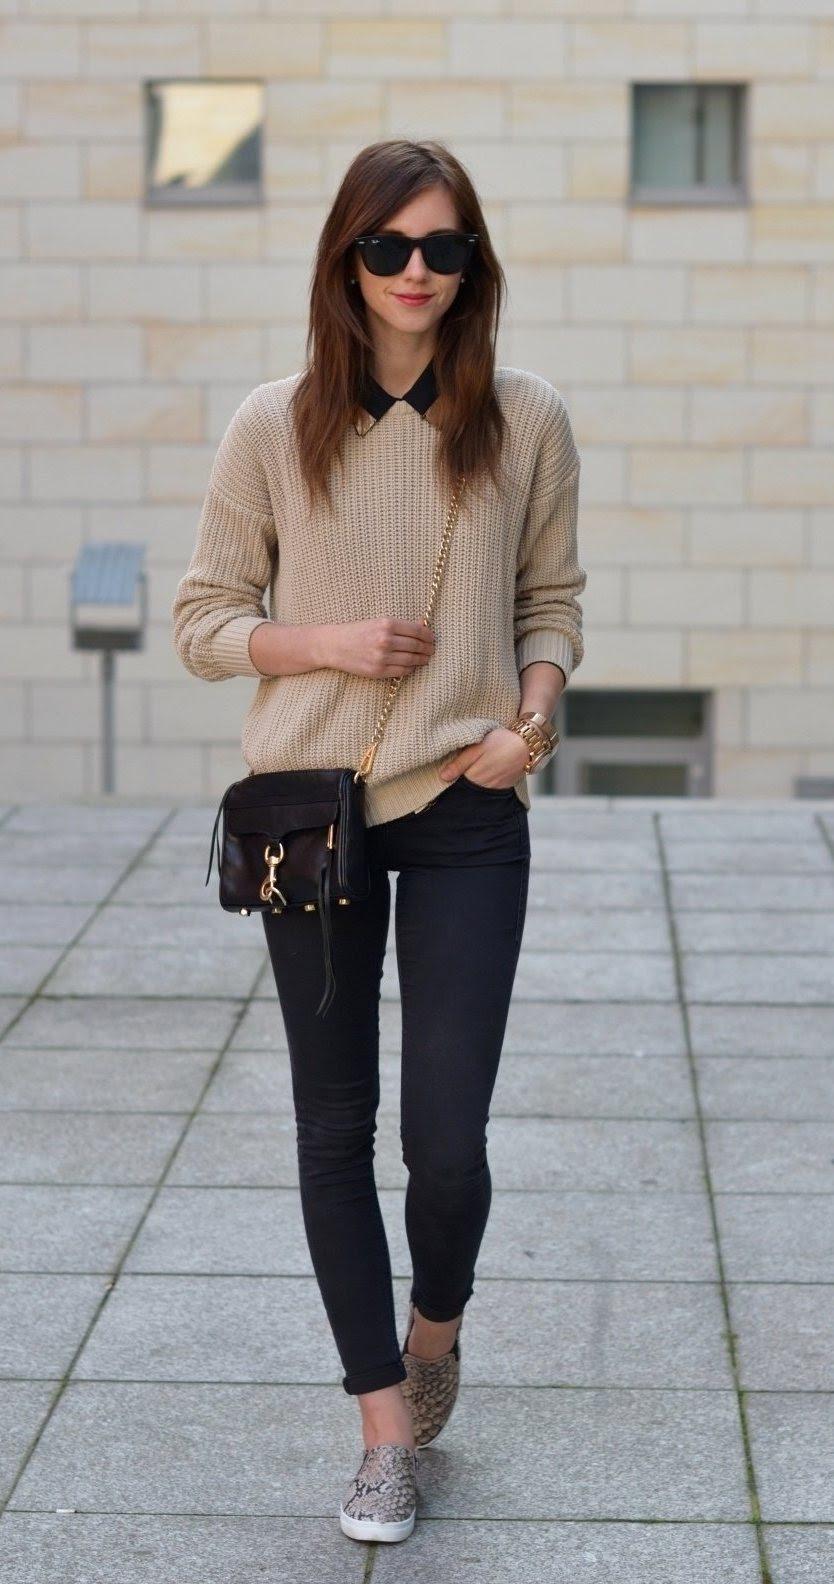 28 stylish winter outfits ideas